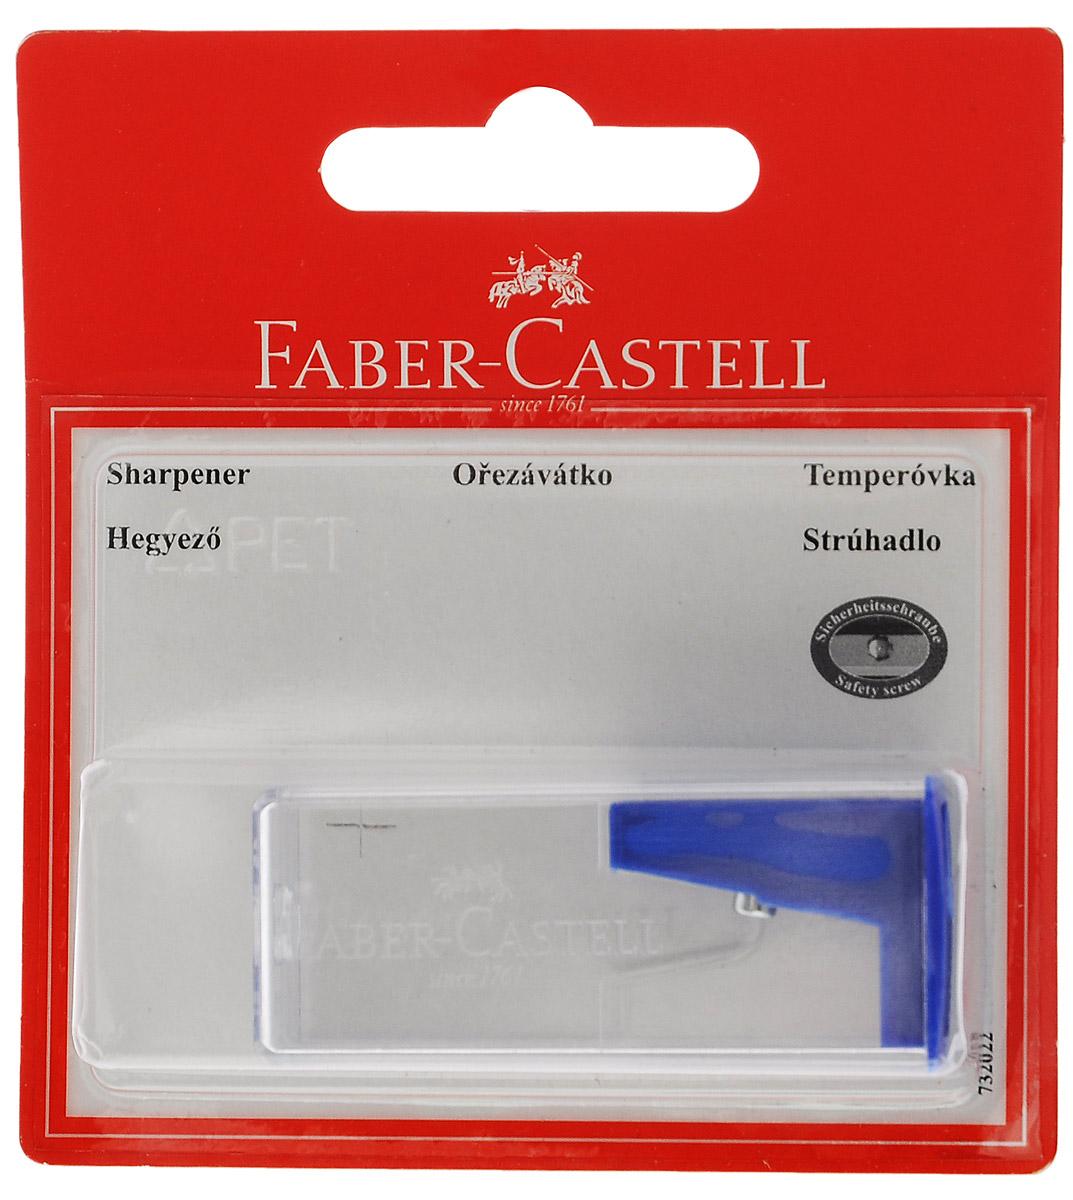 Faber-CastellТочилка с контейнером цвет синий Faber-Castell